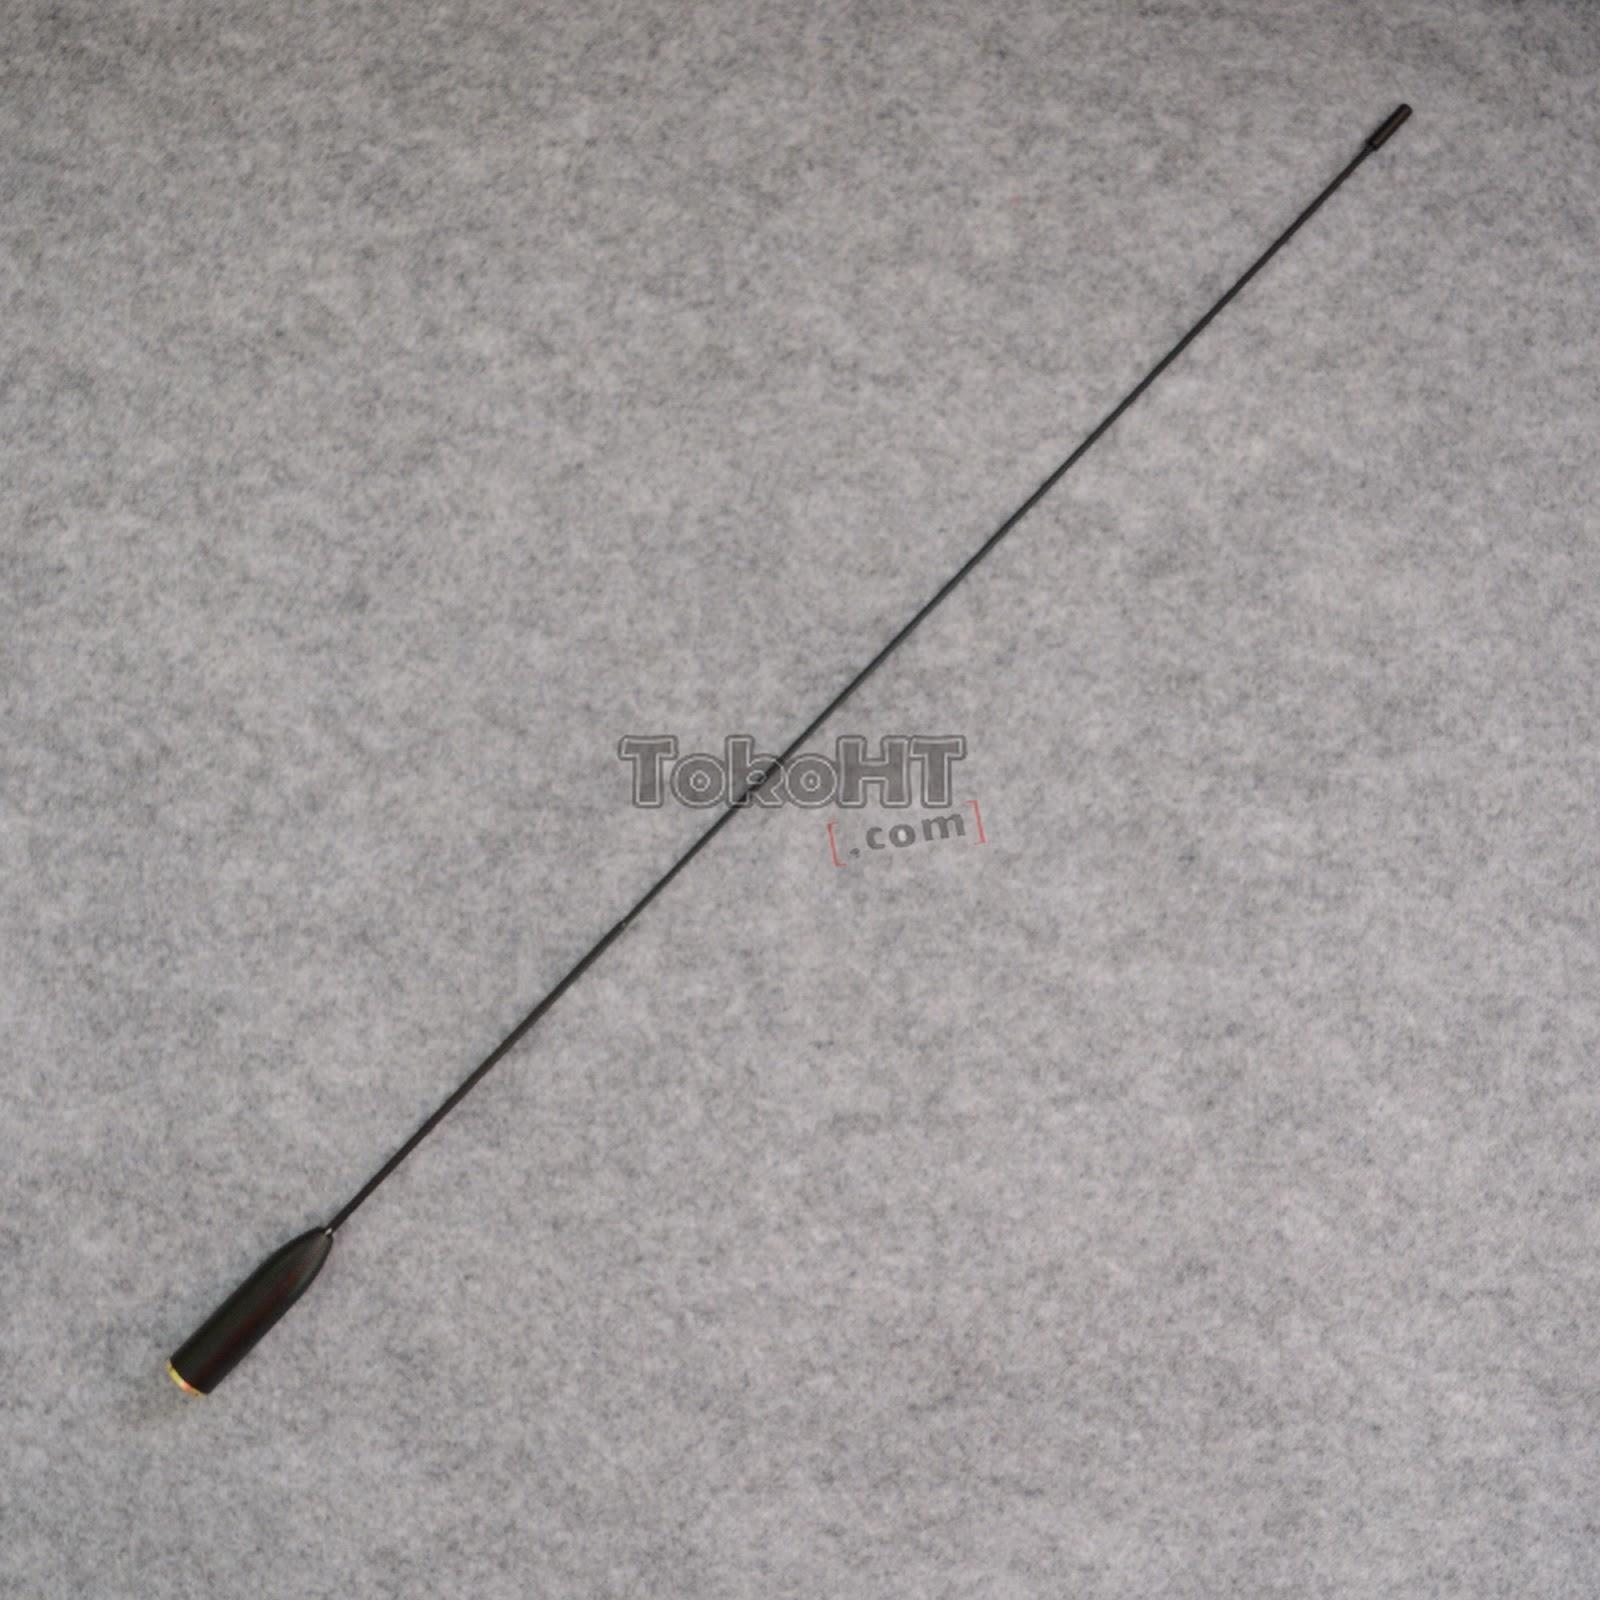 D Antena Rh 771s Dual Band Vhf Uhf